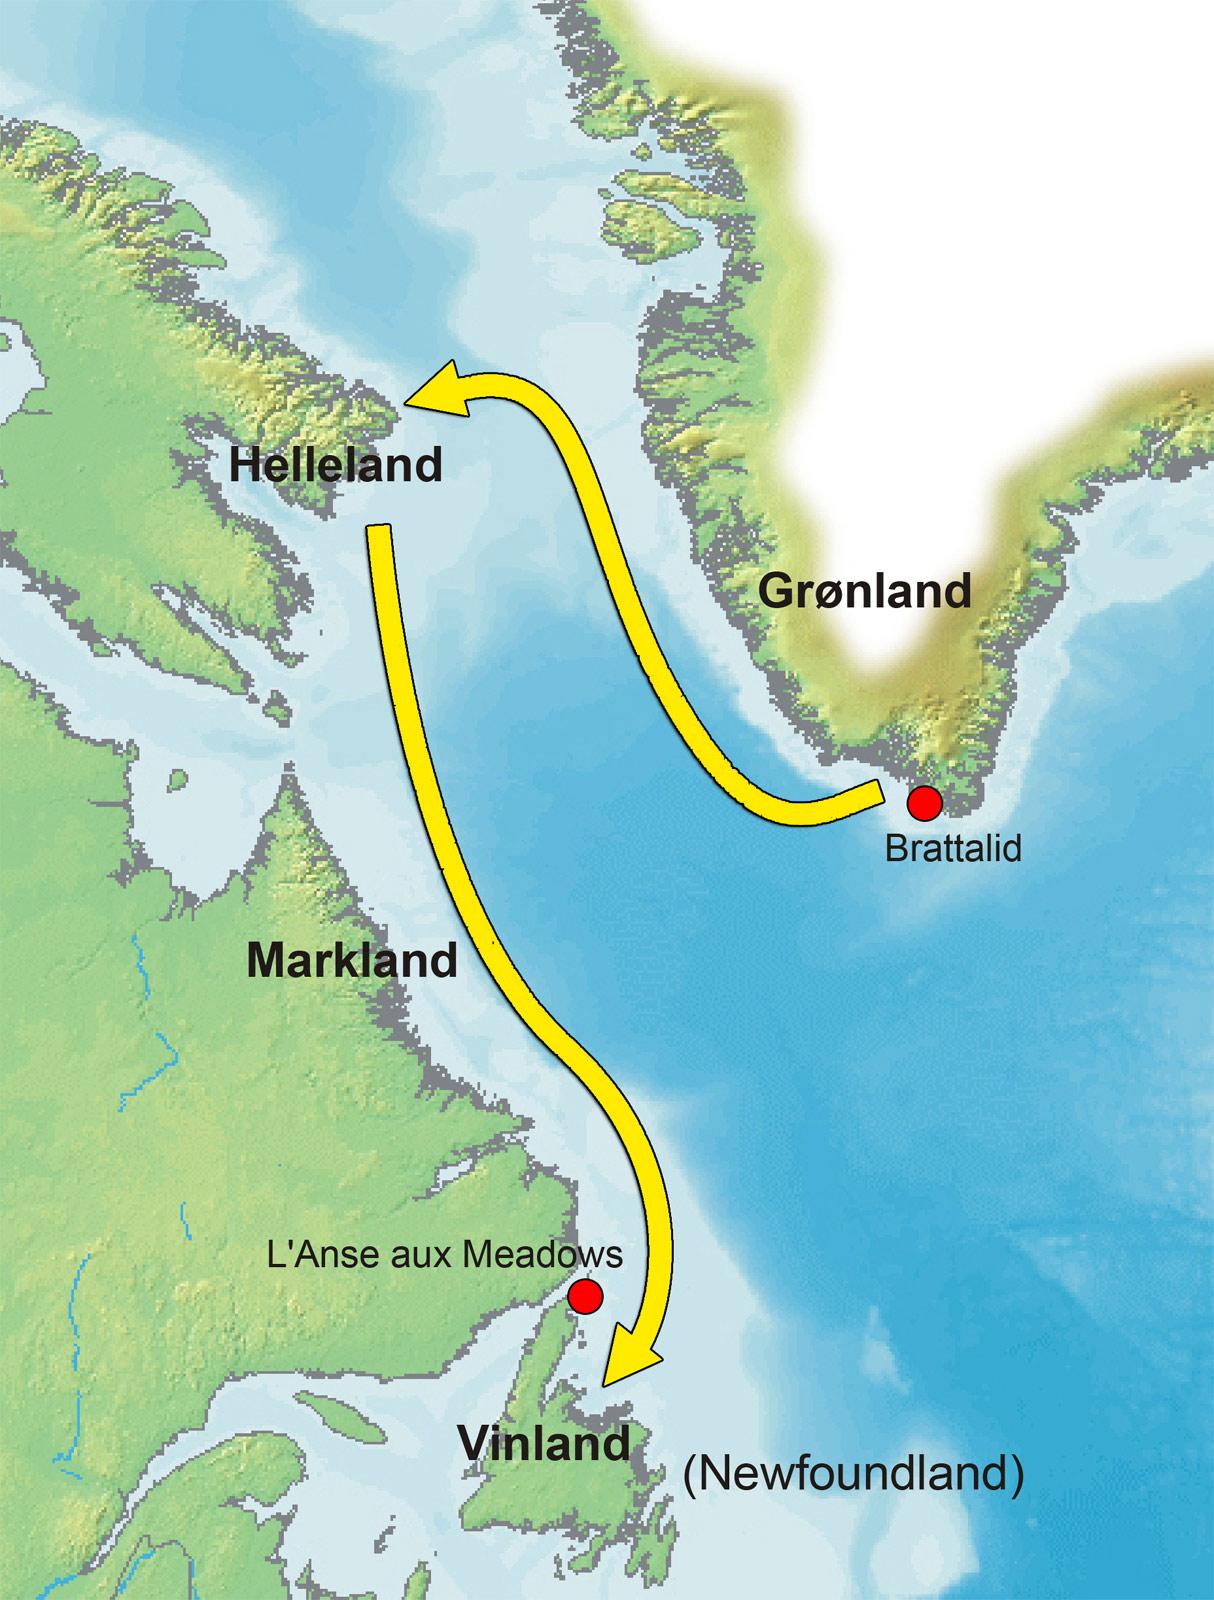 https://i1.wp.com/upload.wikimedia.org/wikipedia/commons/0/04/Vinland-travel.jpg